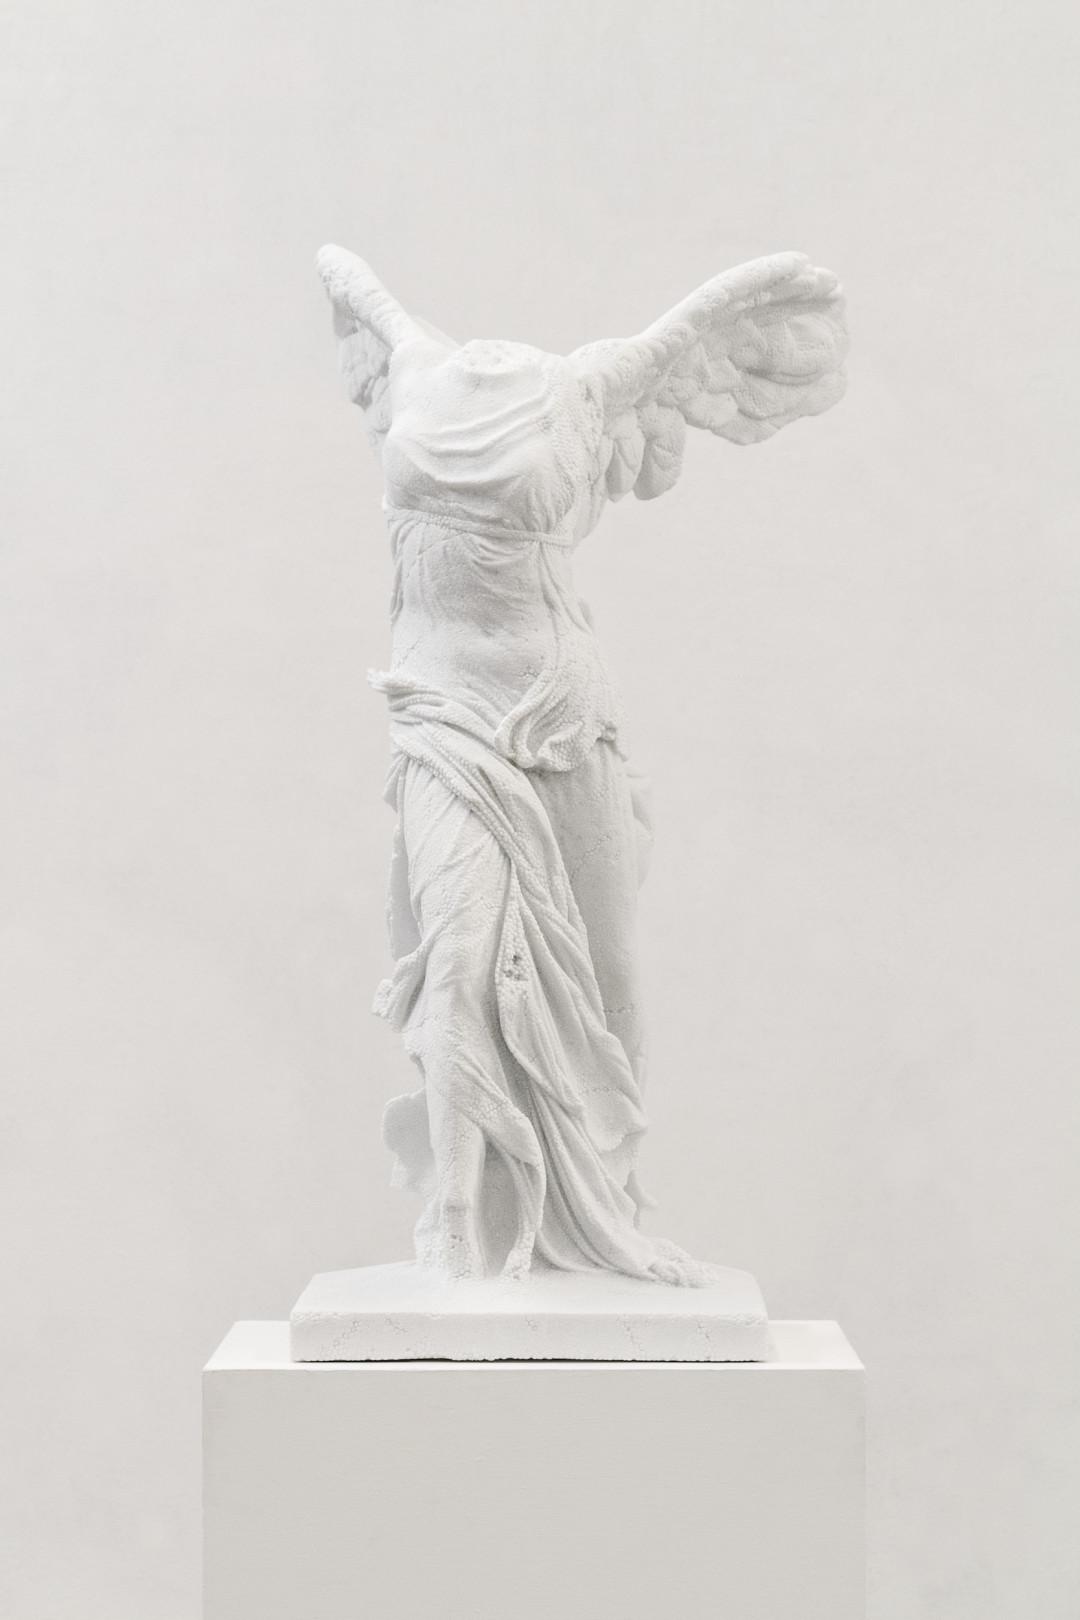 nike-2017-marmo-bianco-123-88-65-img8723